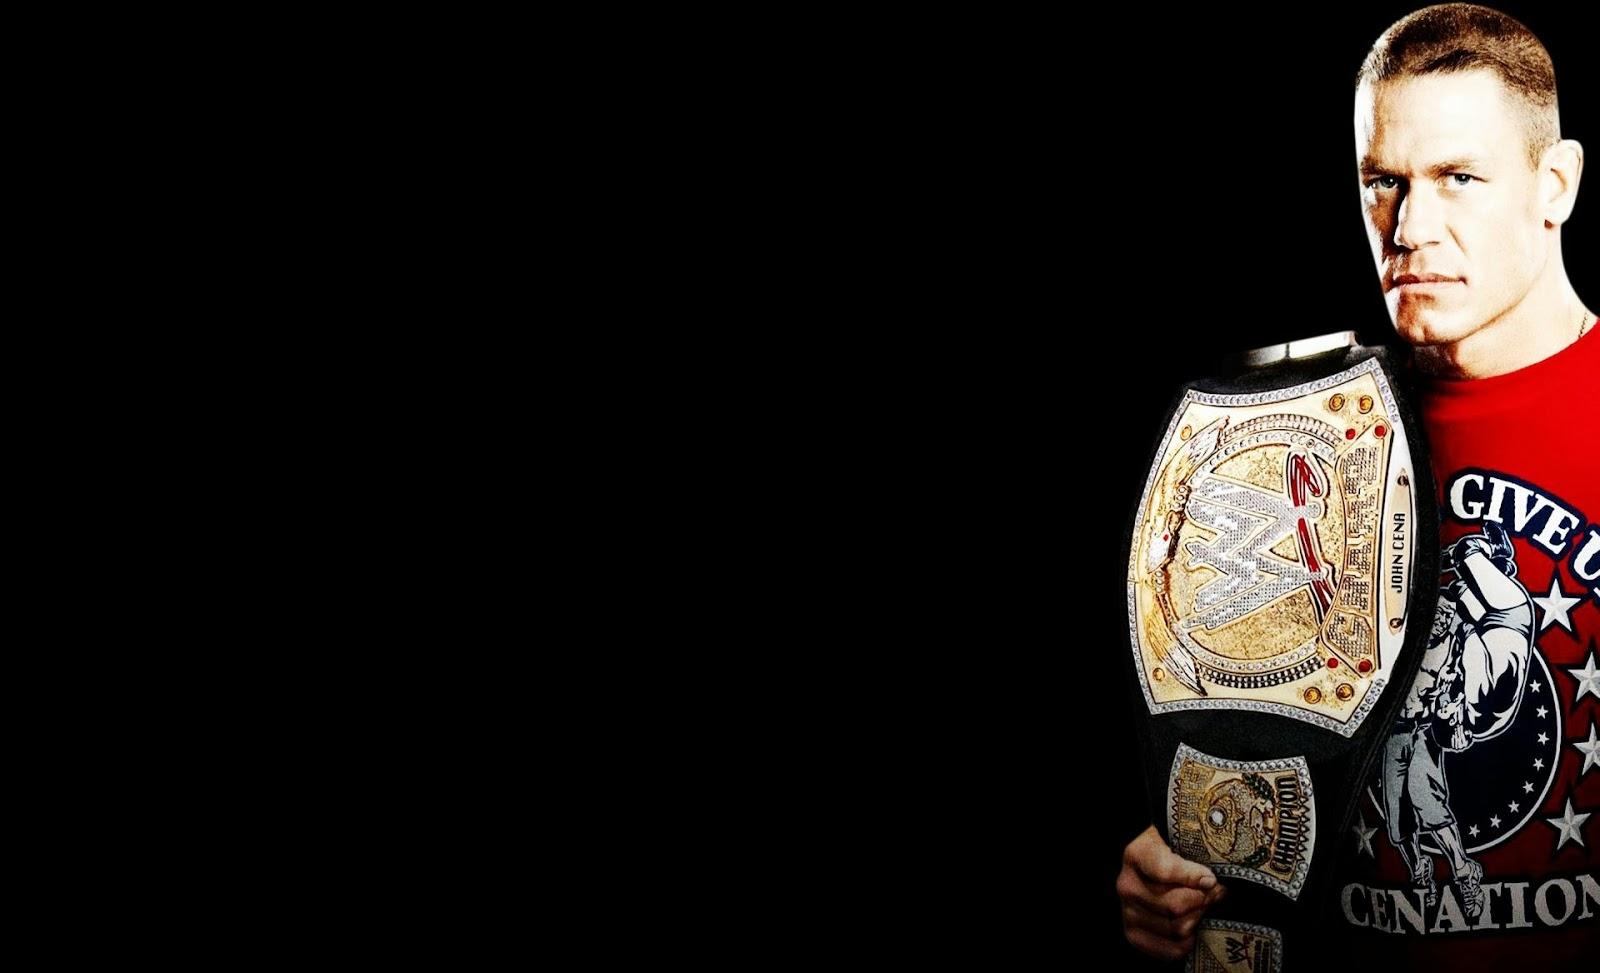 John Cena Hd Wallpapers Download WWE HD WALLPAPER FREE DOWNLOAD 1600x973